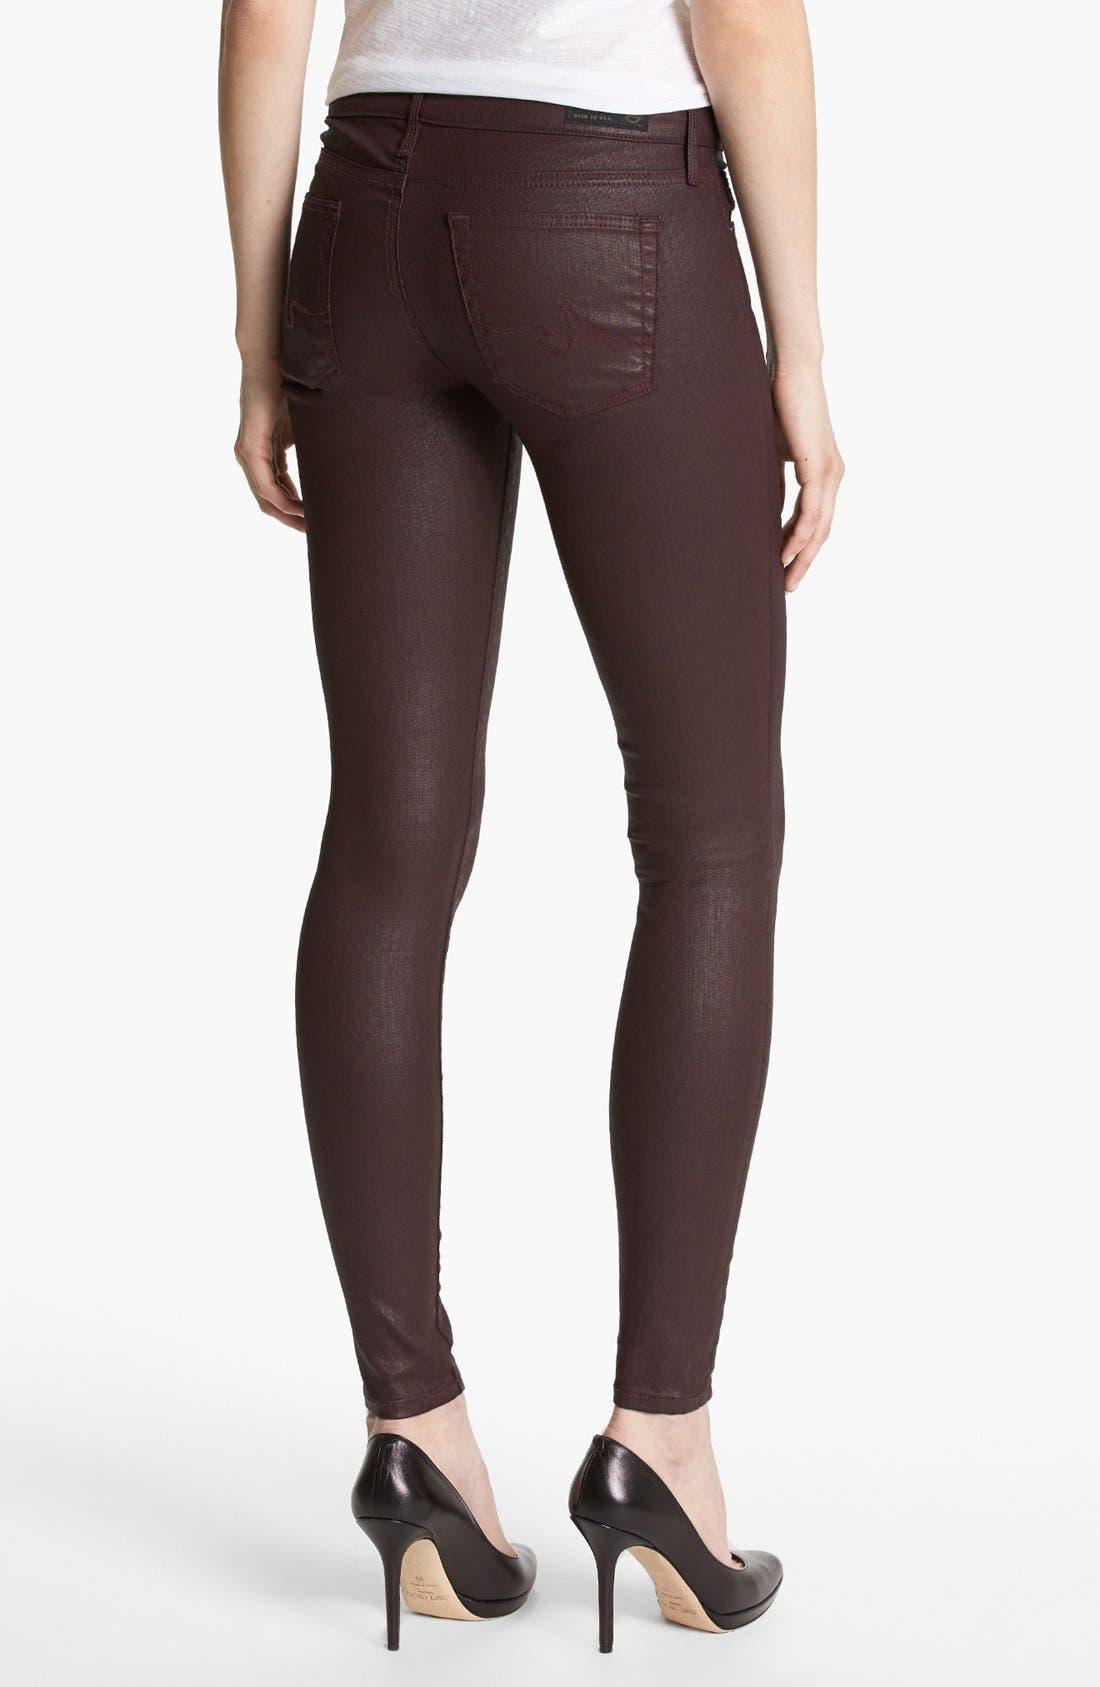 Alternate Image 2  - AG 'The Absolute Legging' Coated Skinny Jeans (Brave)